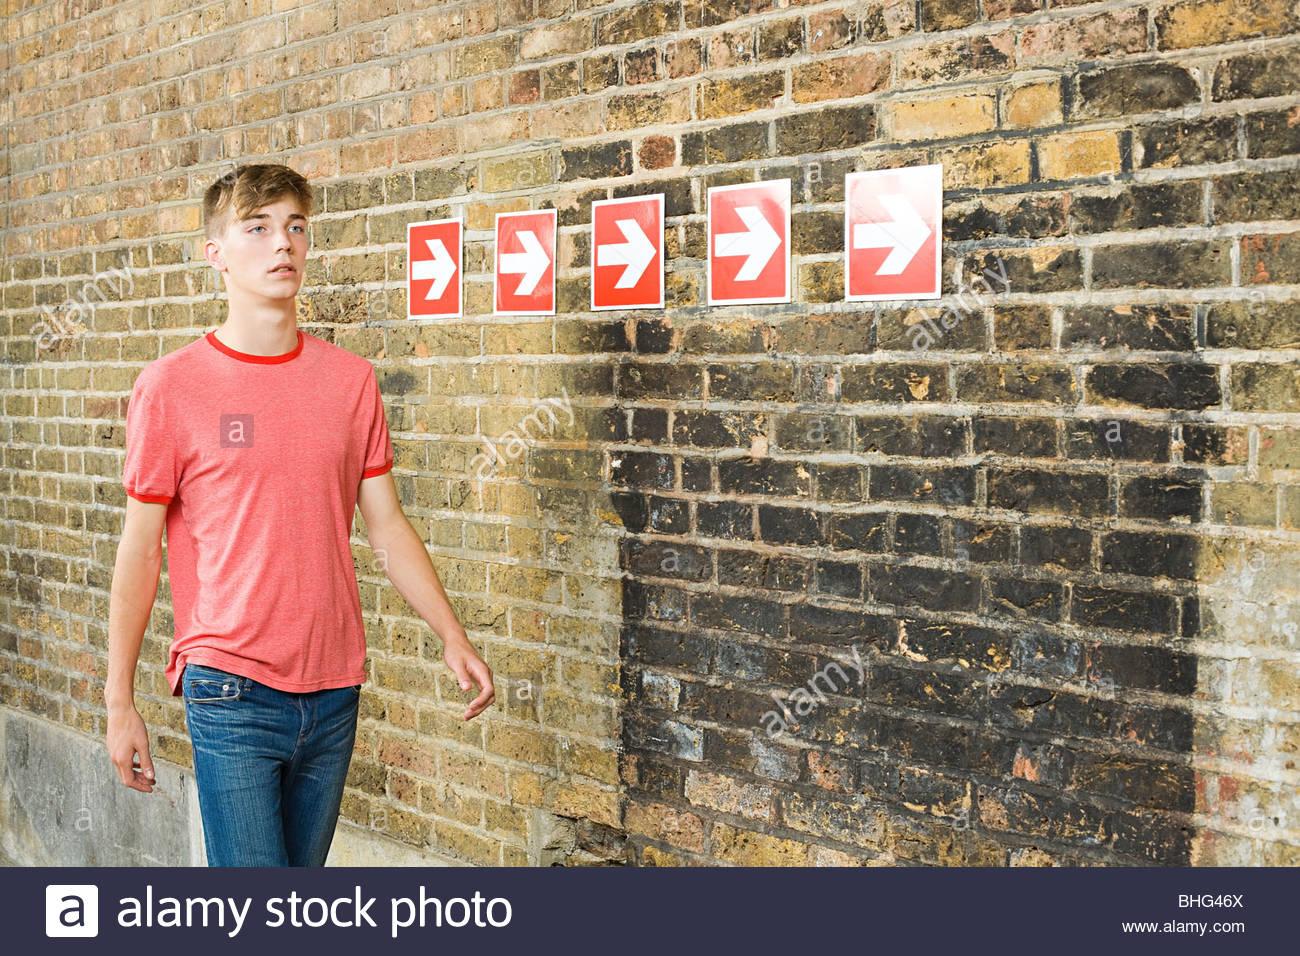 Teenage boy and row of arrows - Stock Image